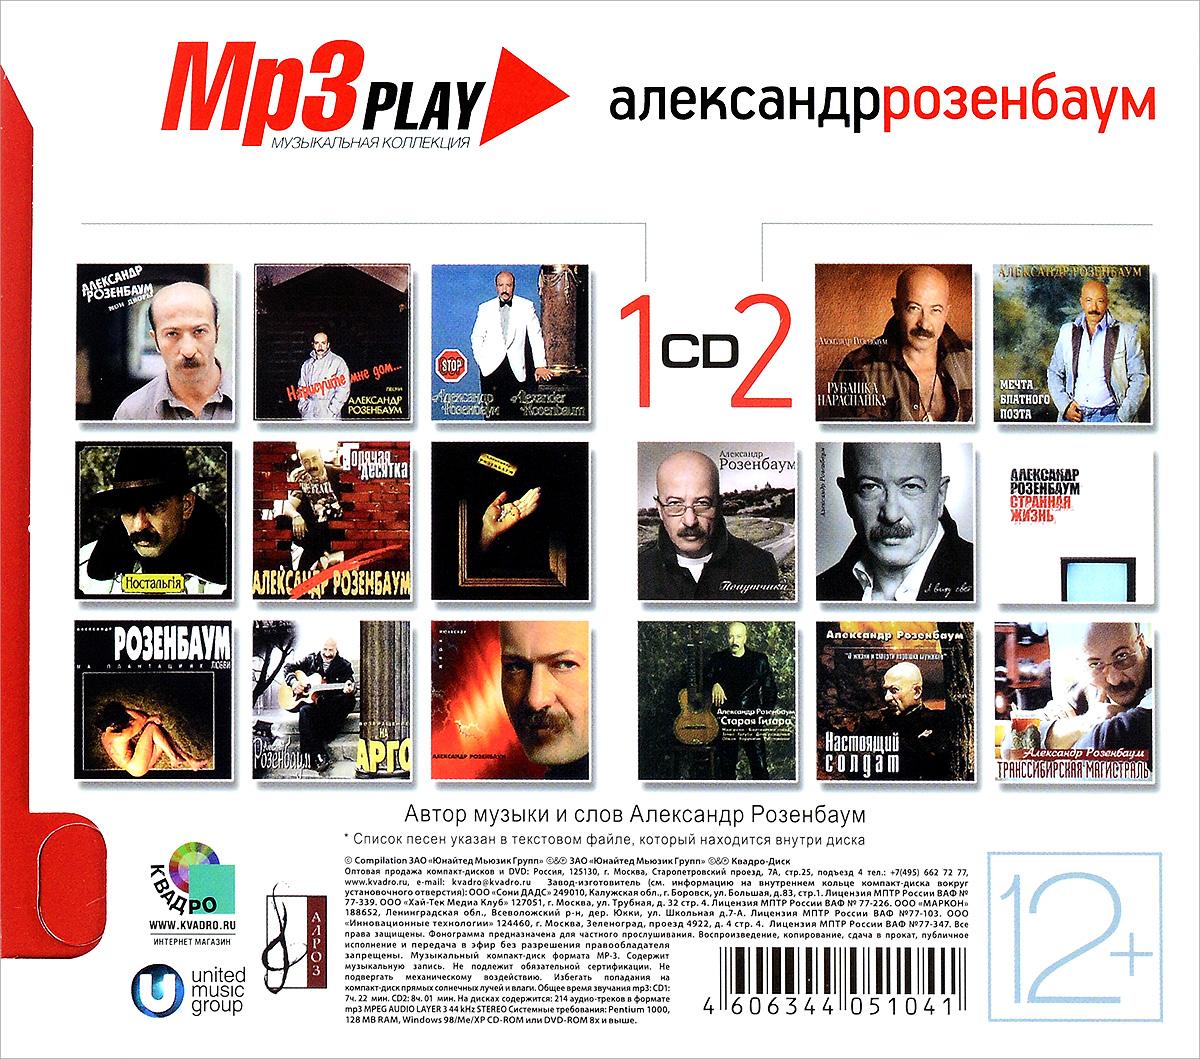 MP3 Play. Александр Розенбаум (mp3)